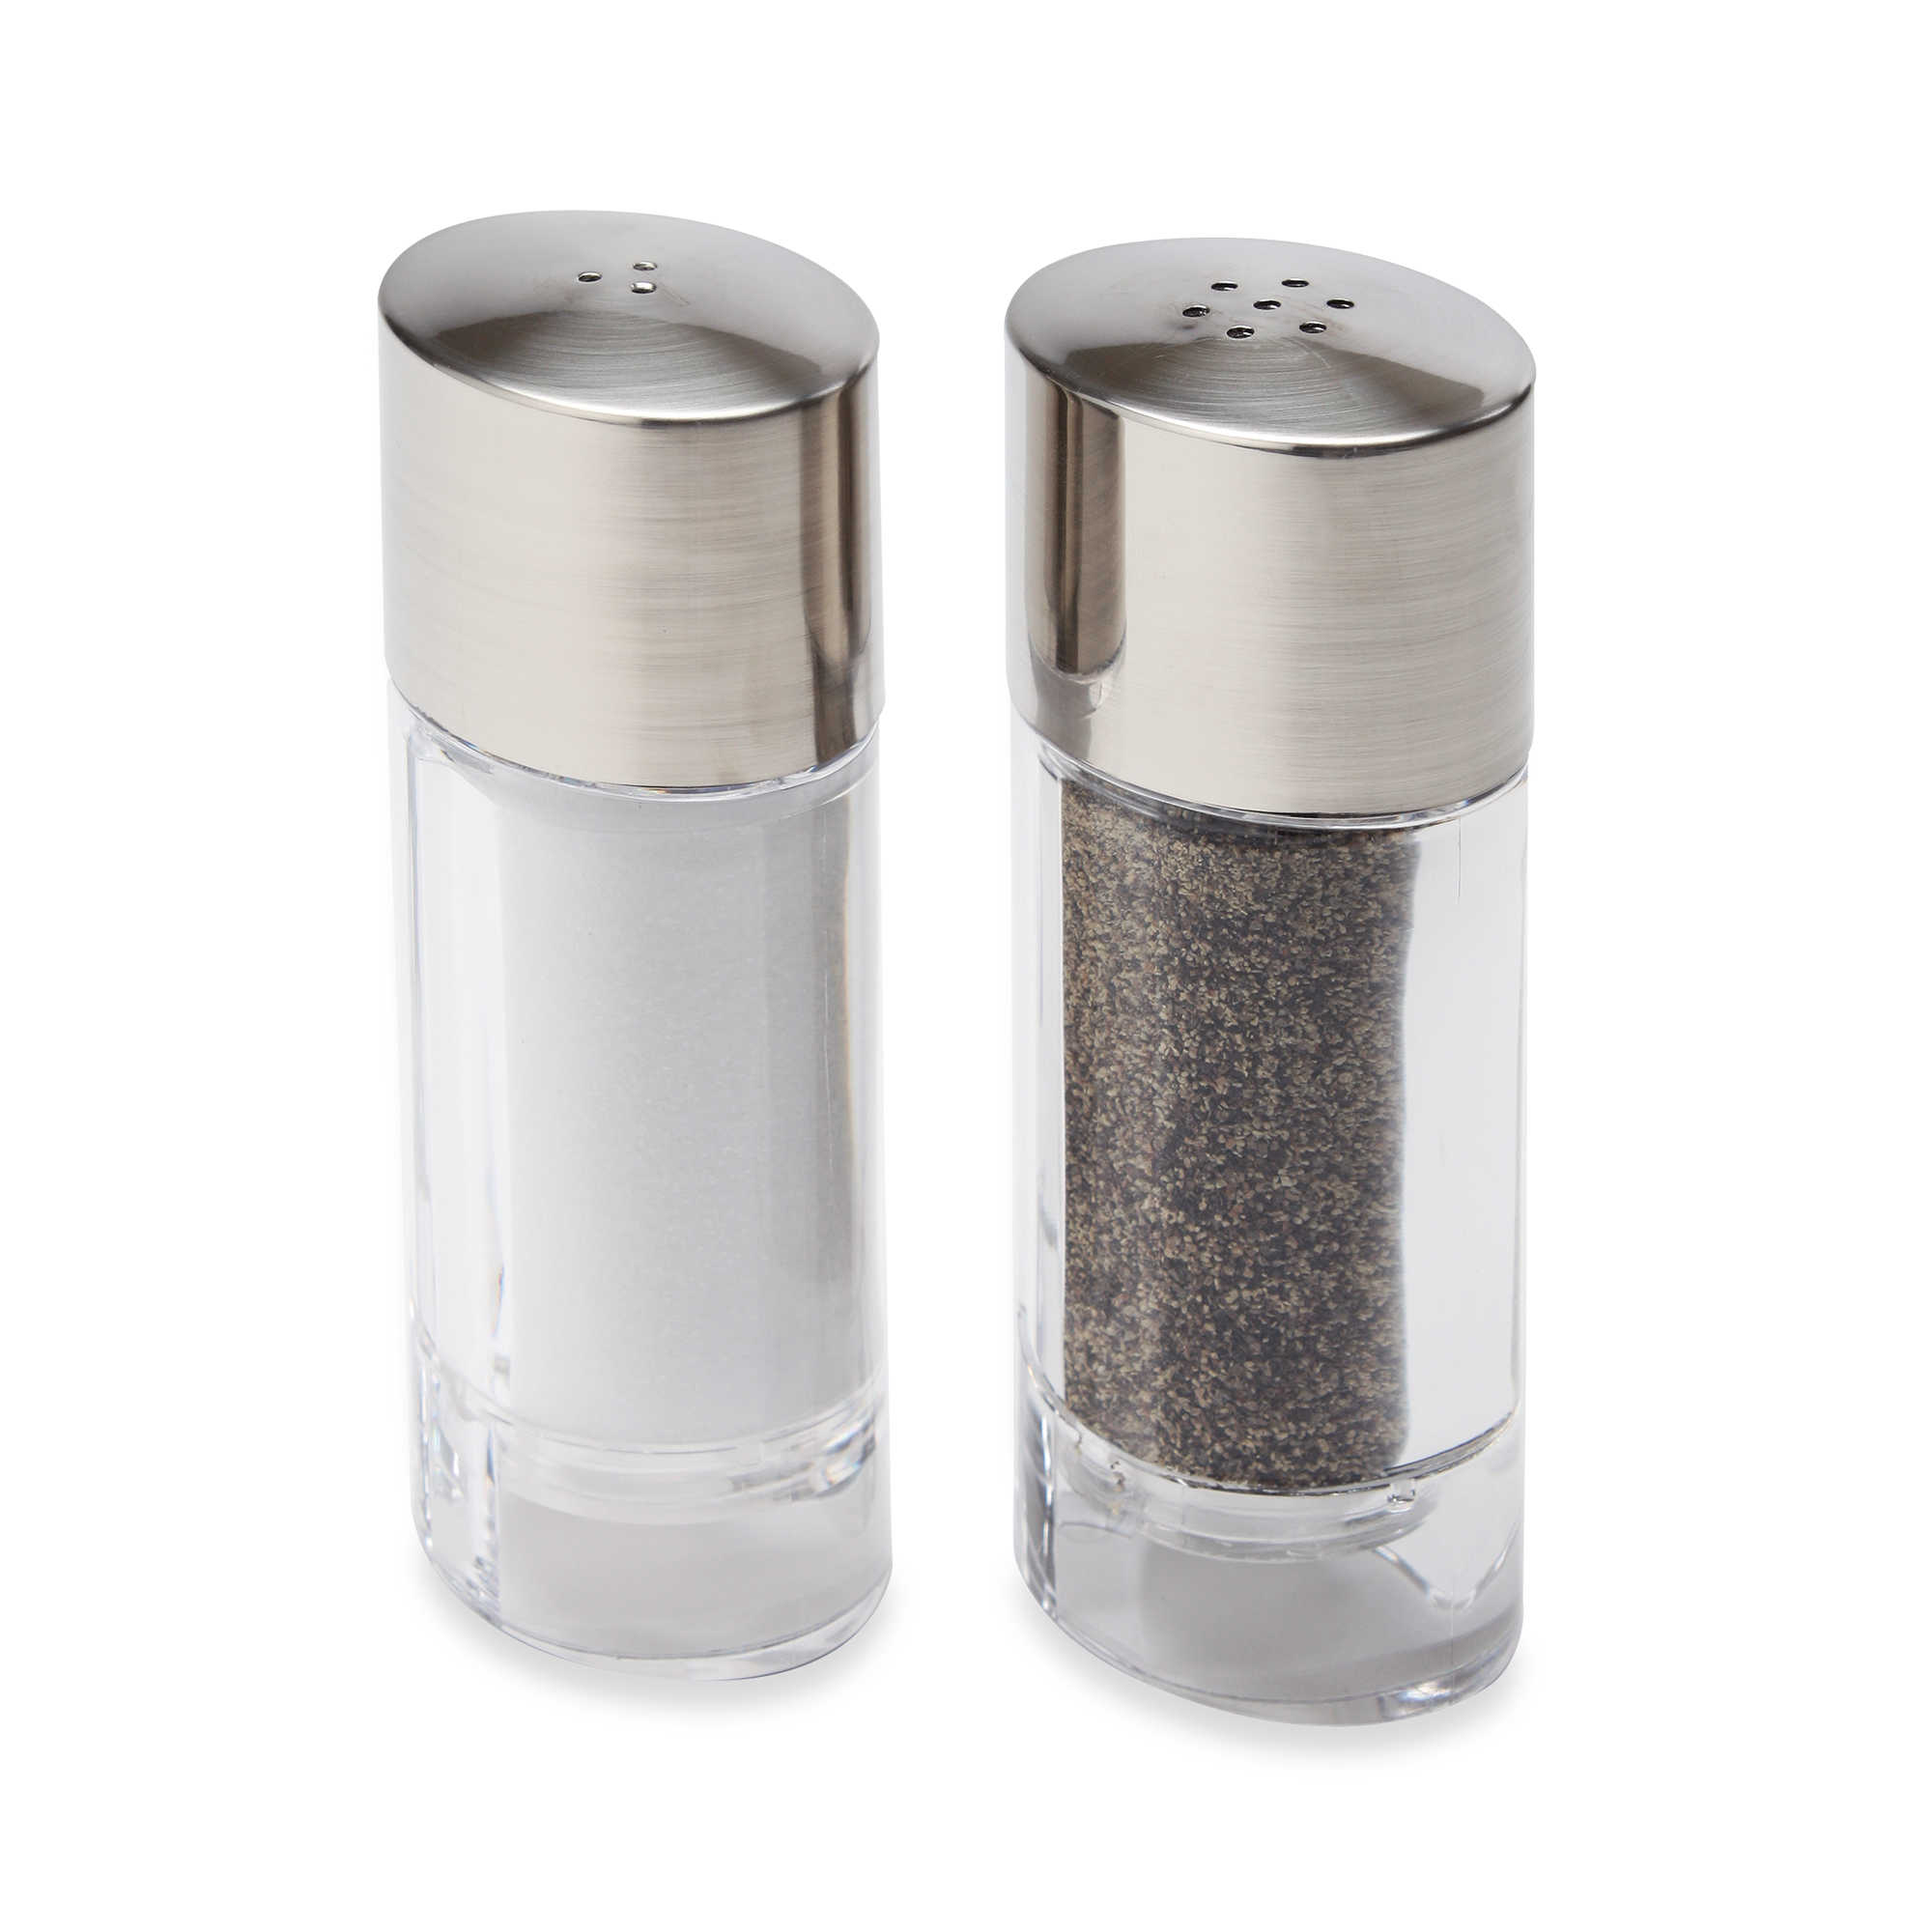 kitchen art salt and pepper dispensers  kitchen design - image of olde thompson salt pepper shaker set in marquis